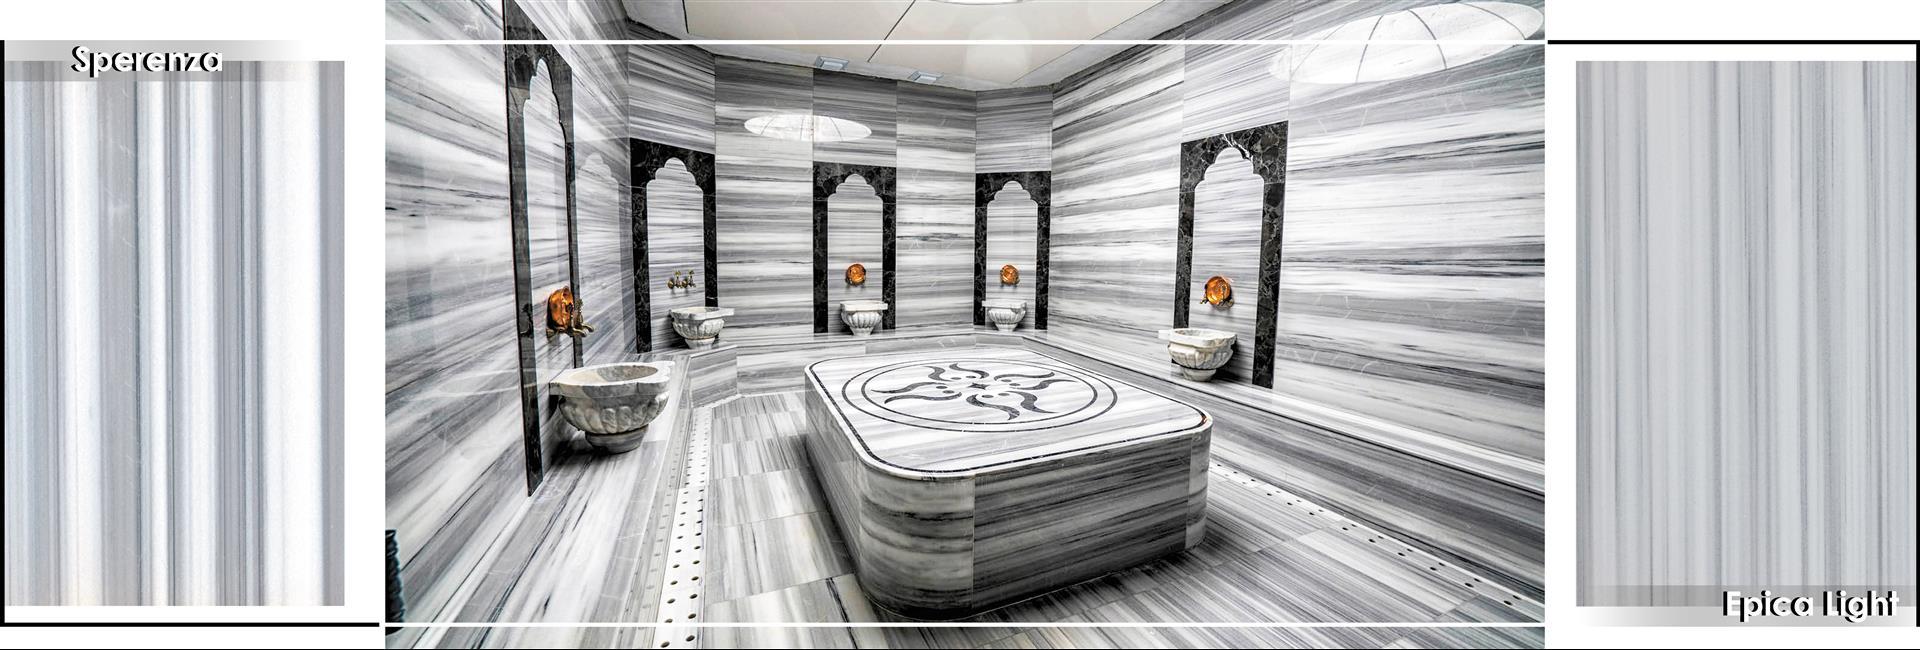 Marmara White Marble - Sperenza